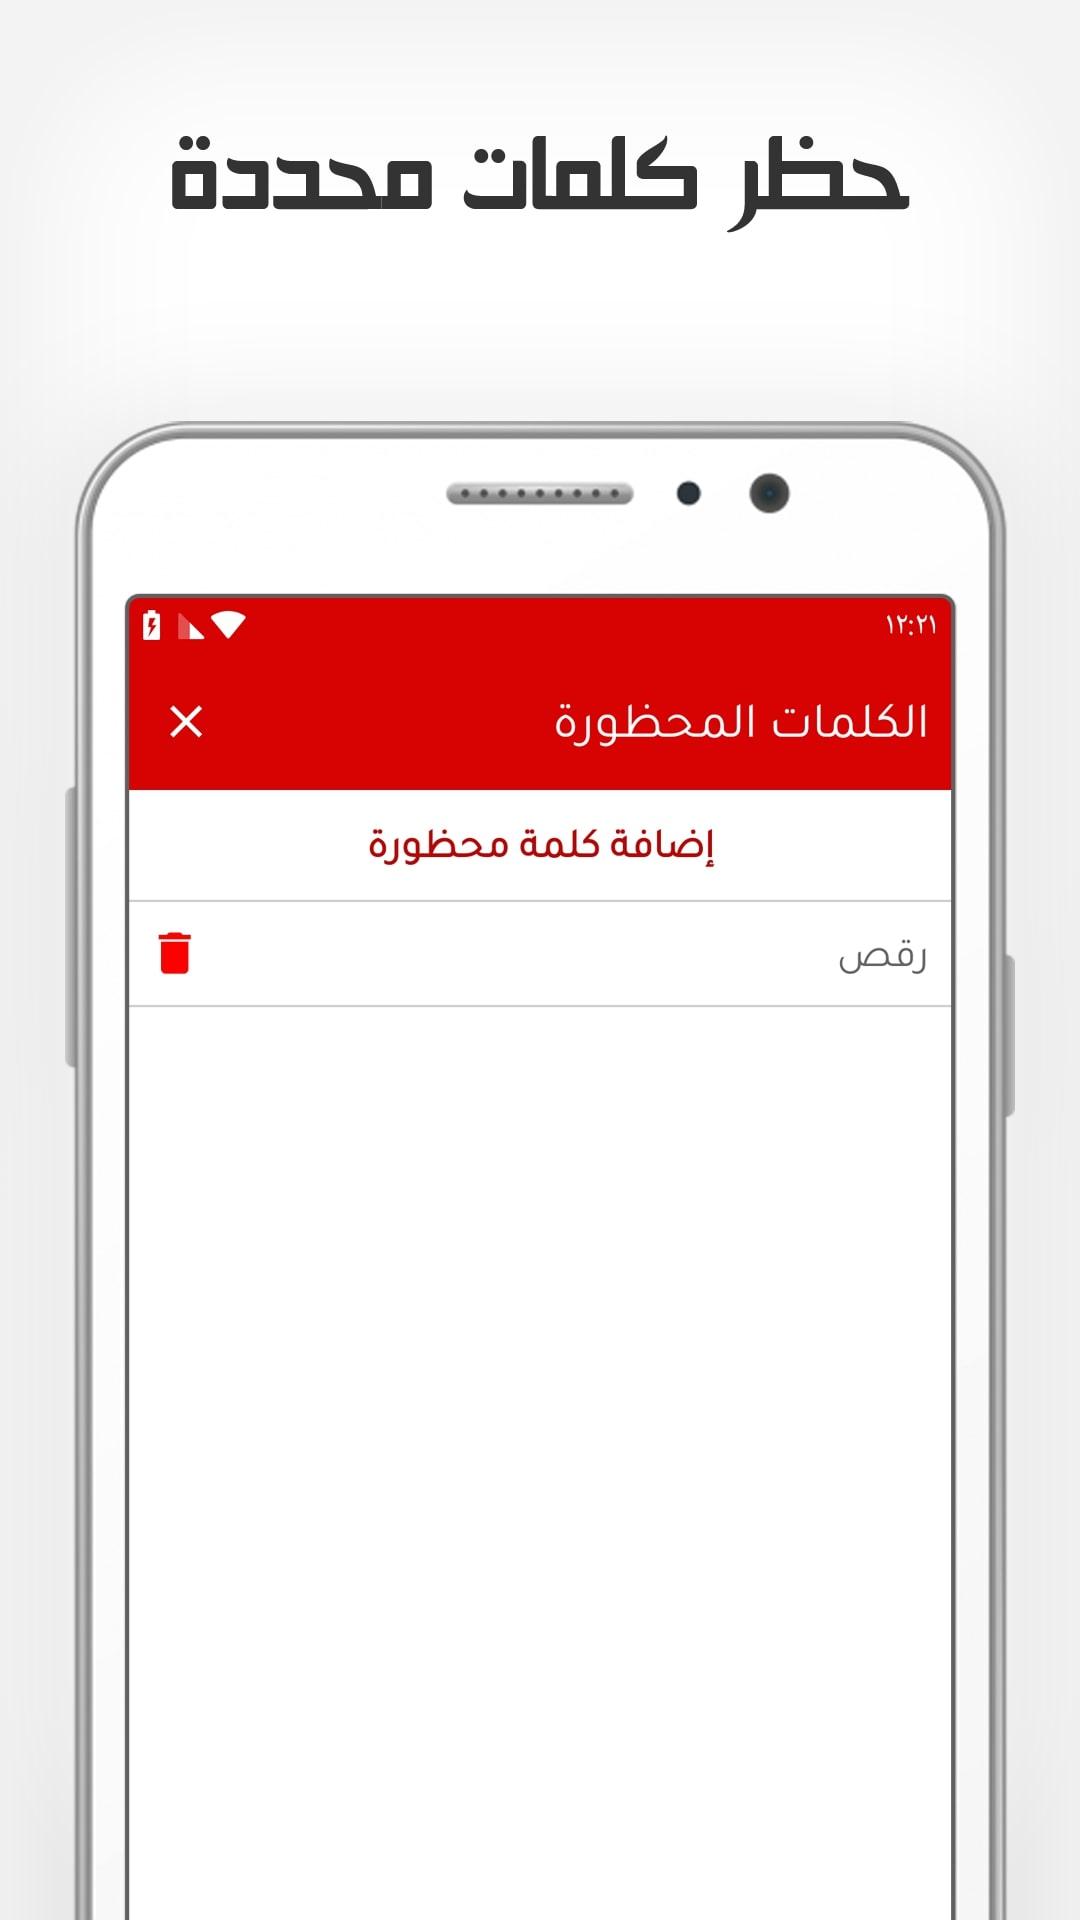 aa3_apps.com_app_sc_kidstube_ar_6.jpg